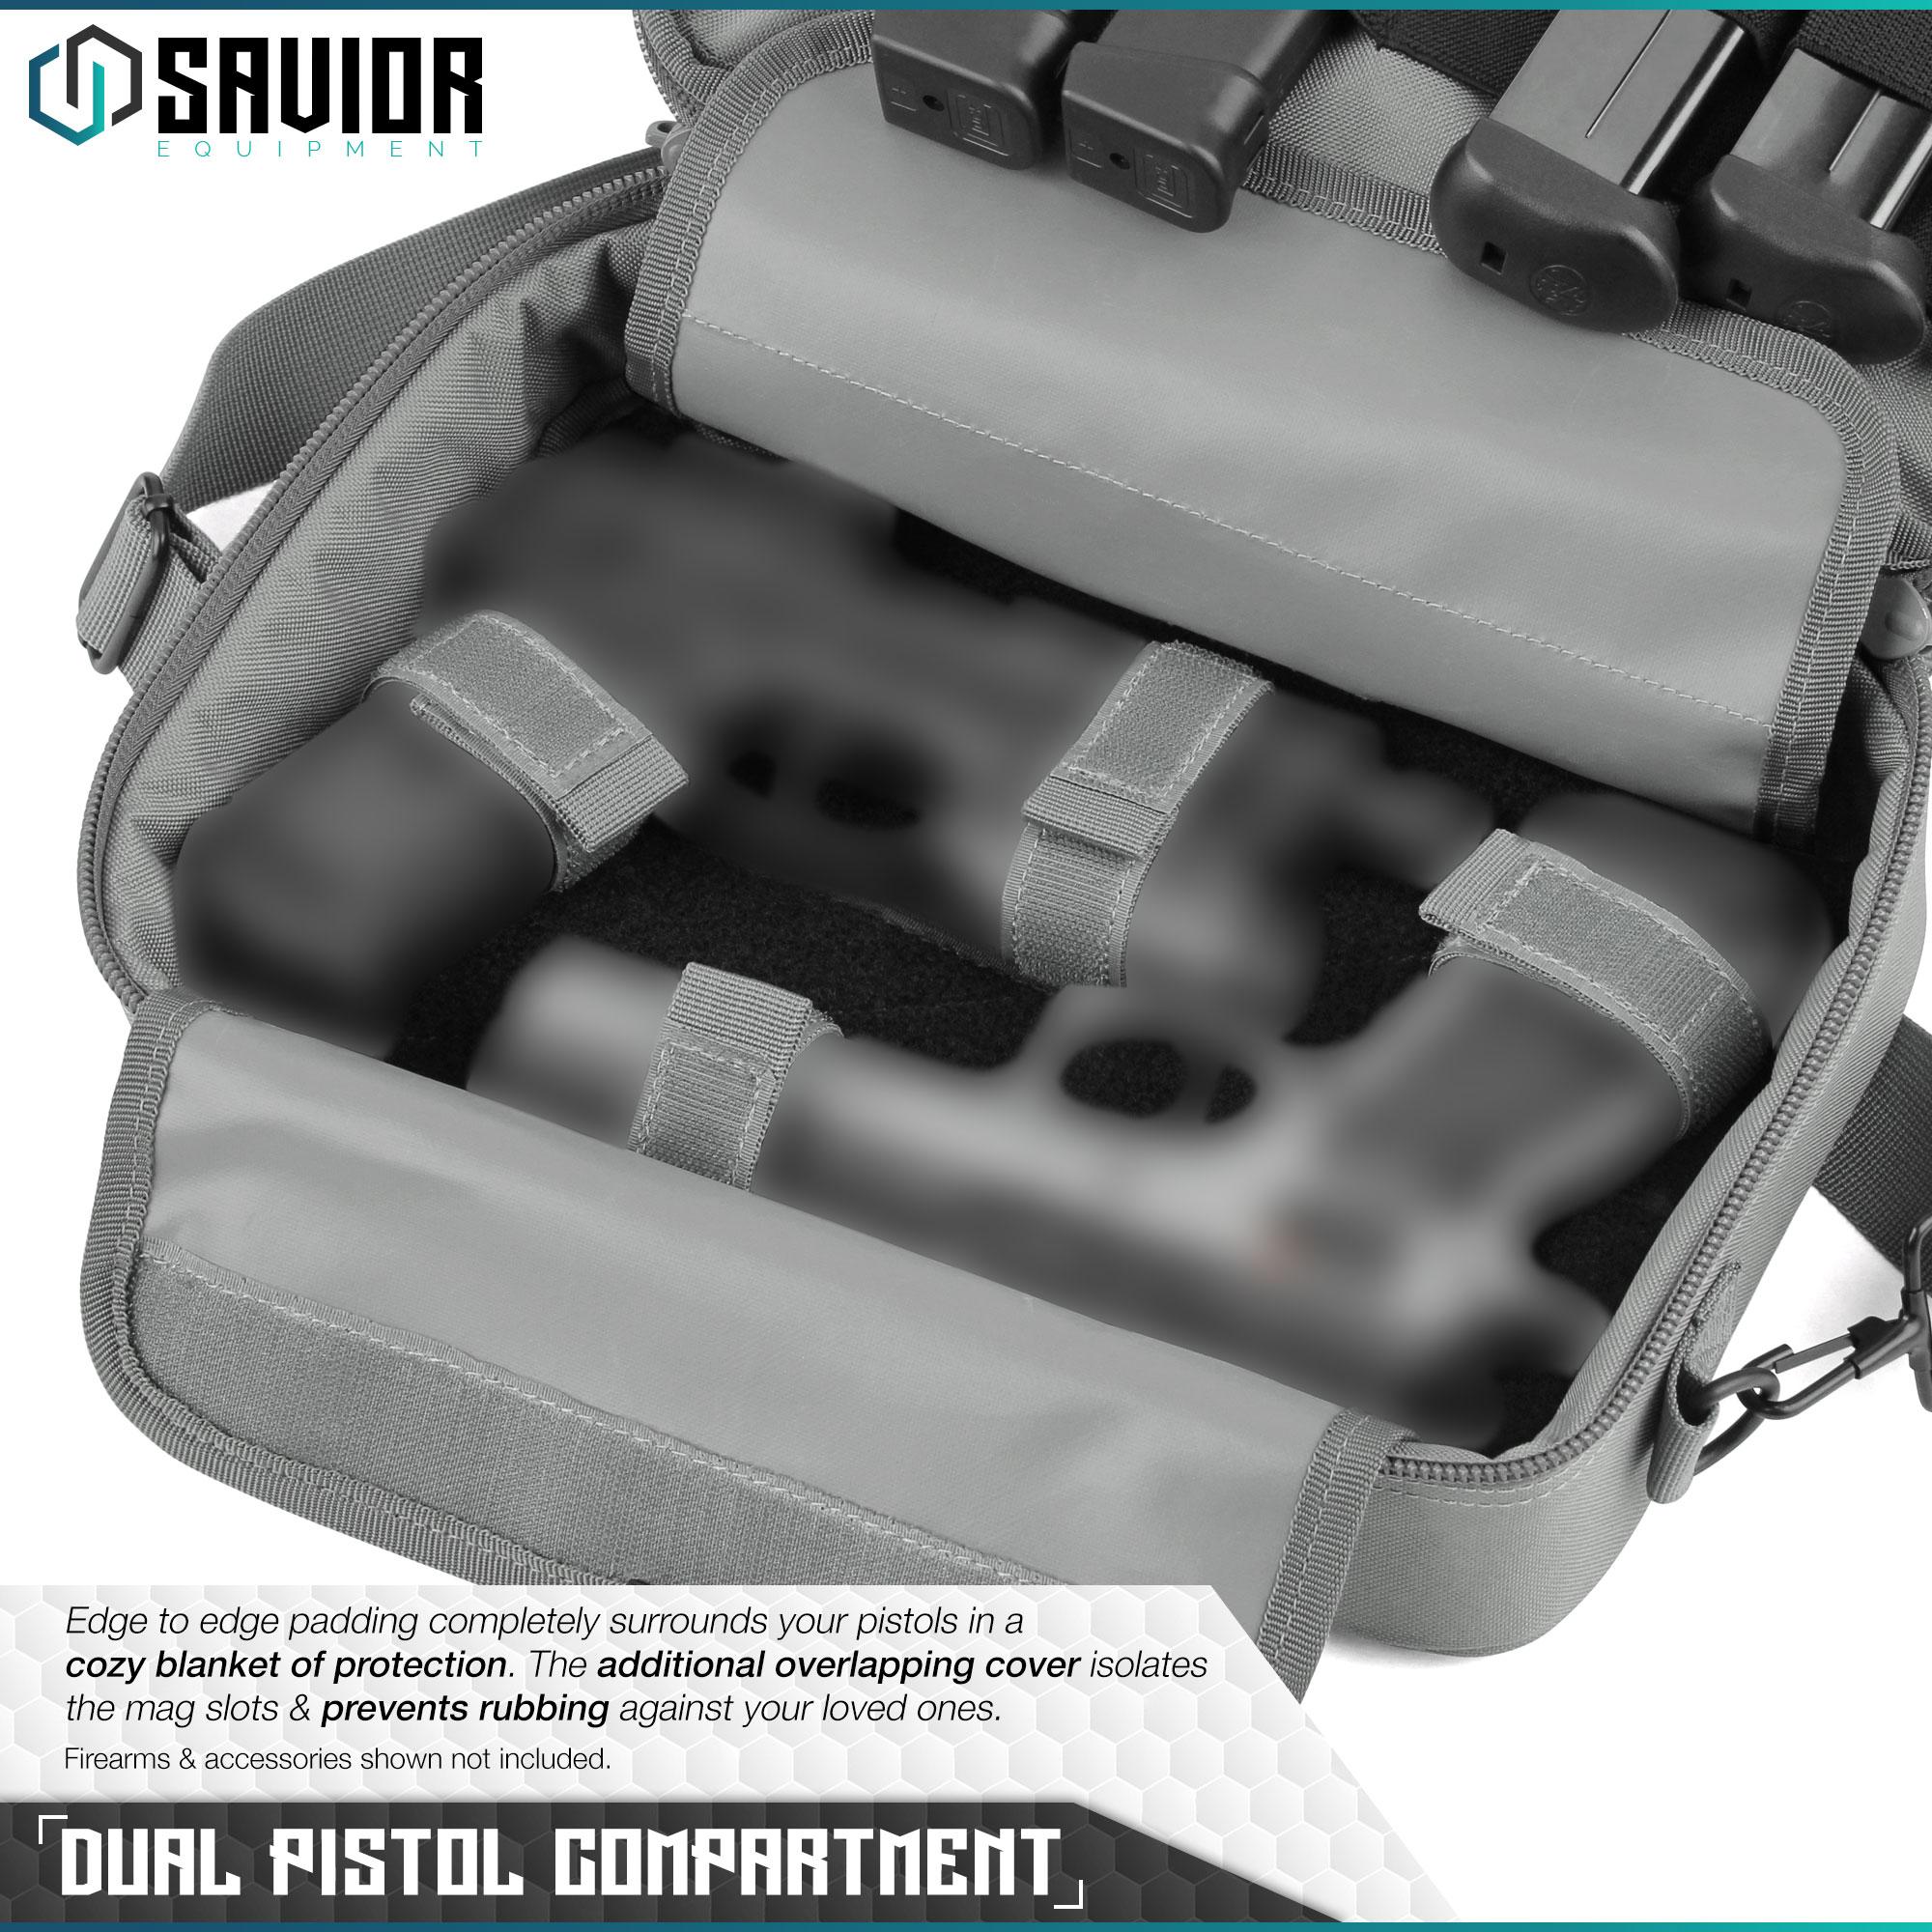 034-SAVIOR-034-Padded-Discreet-Double-Handgun-Bag-Pistol-Storage-Case-w-Mag-Pouch-Slot thumbnail 3